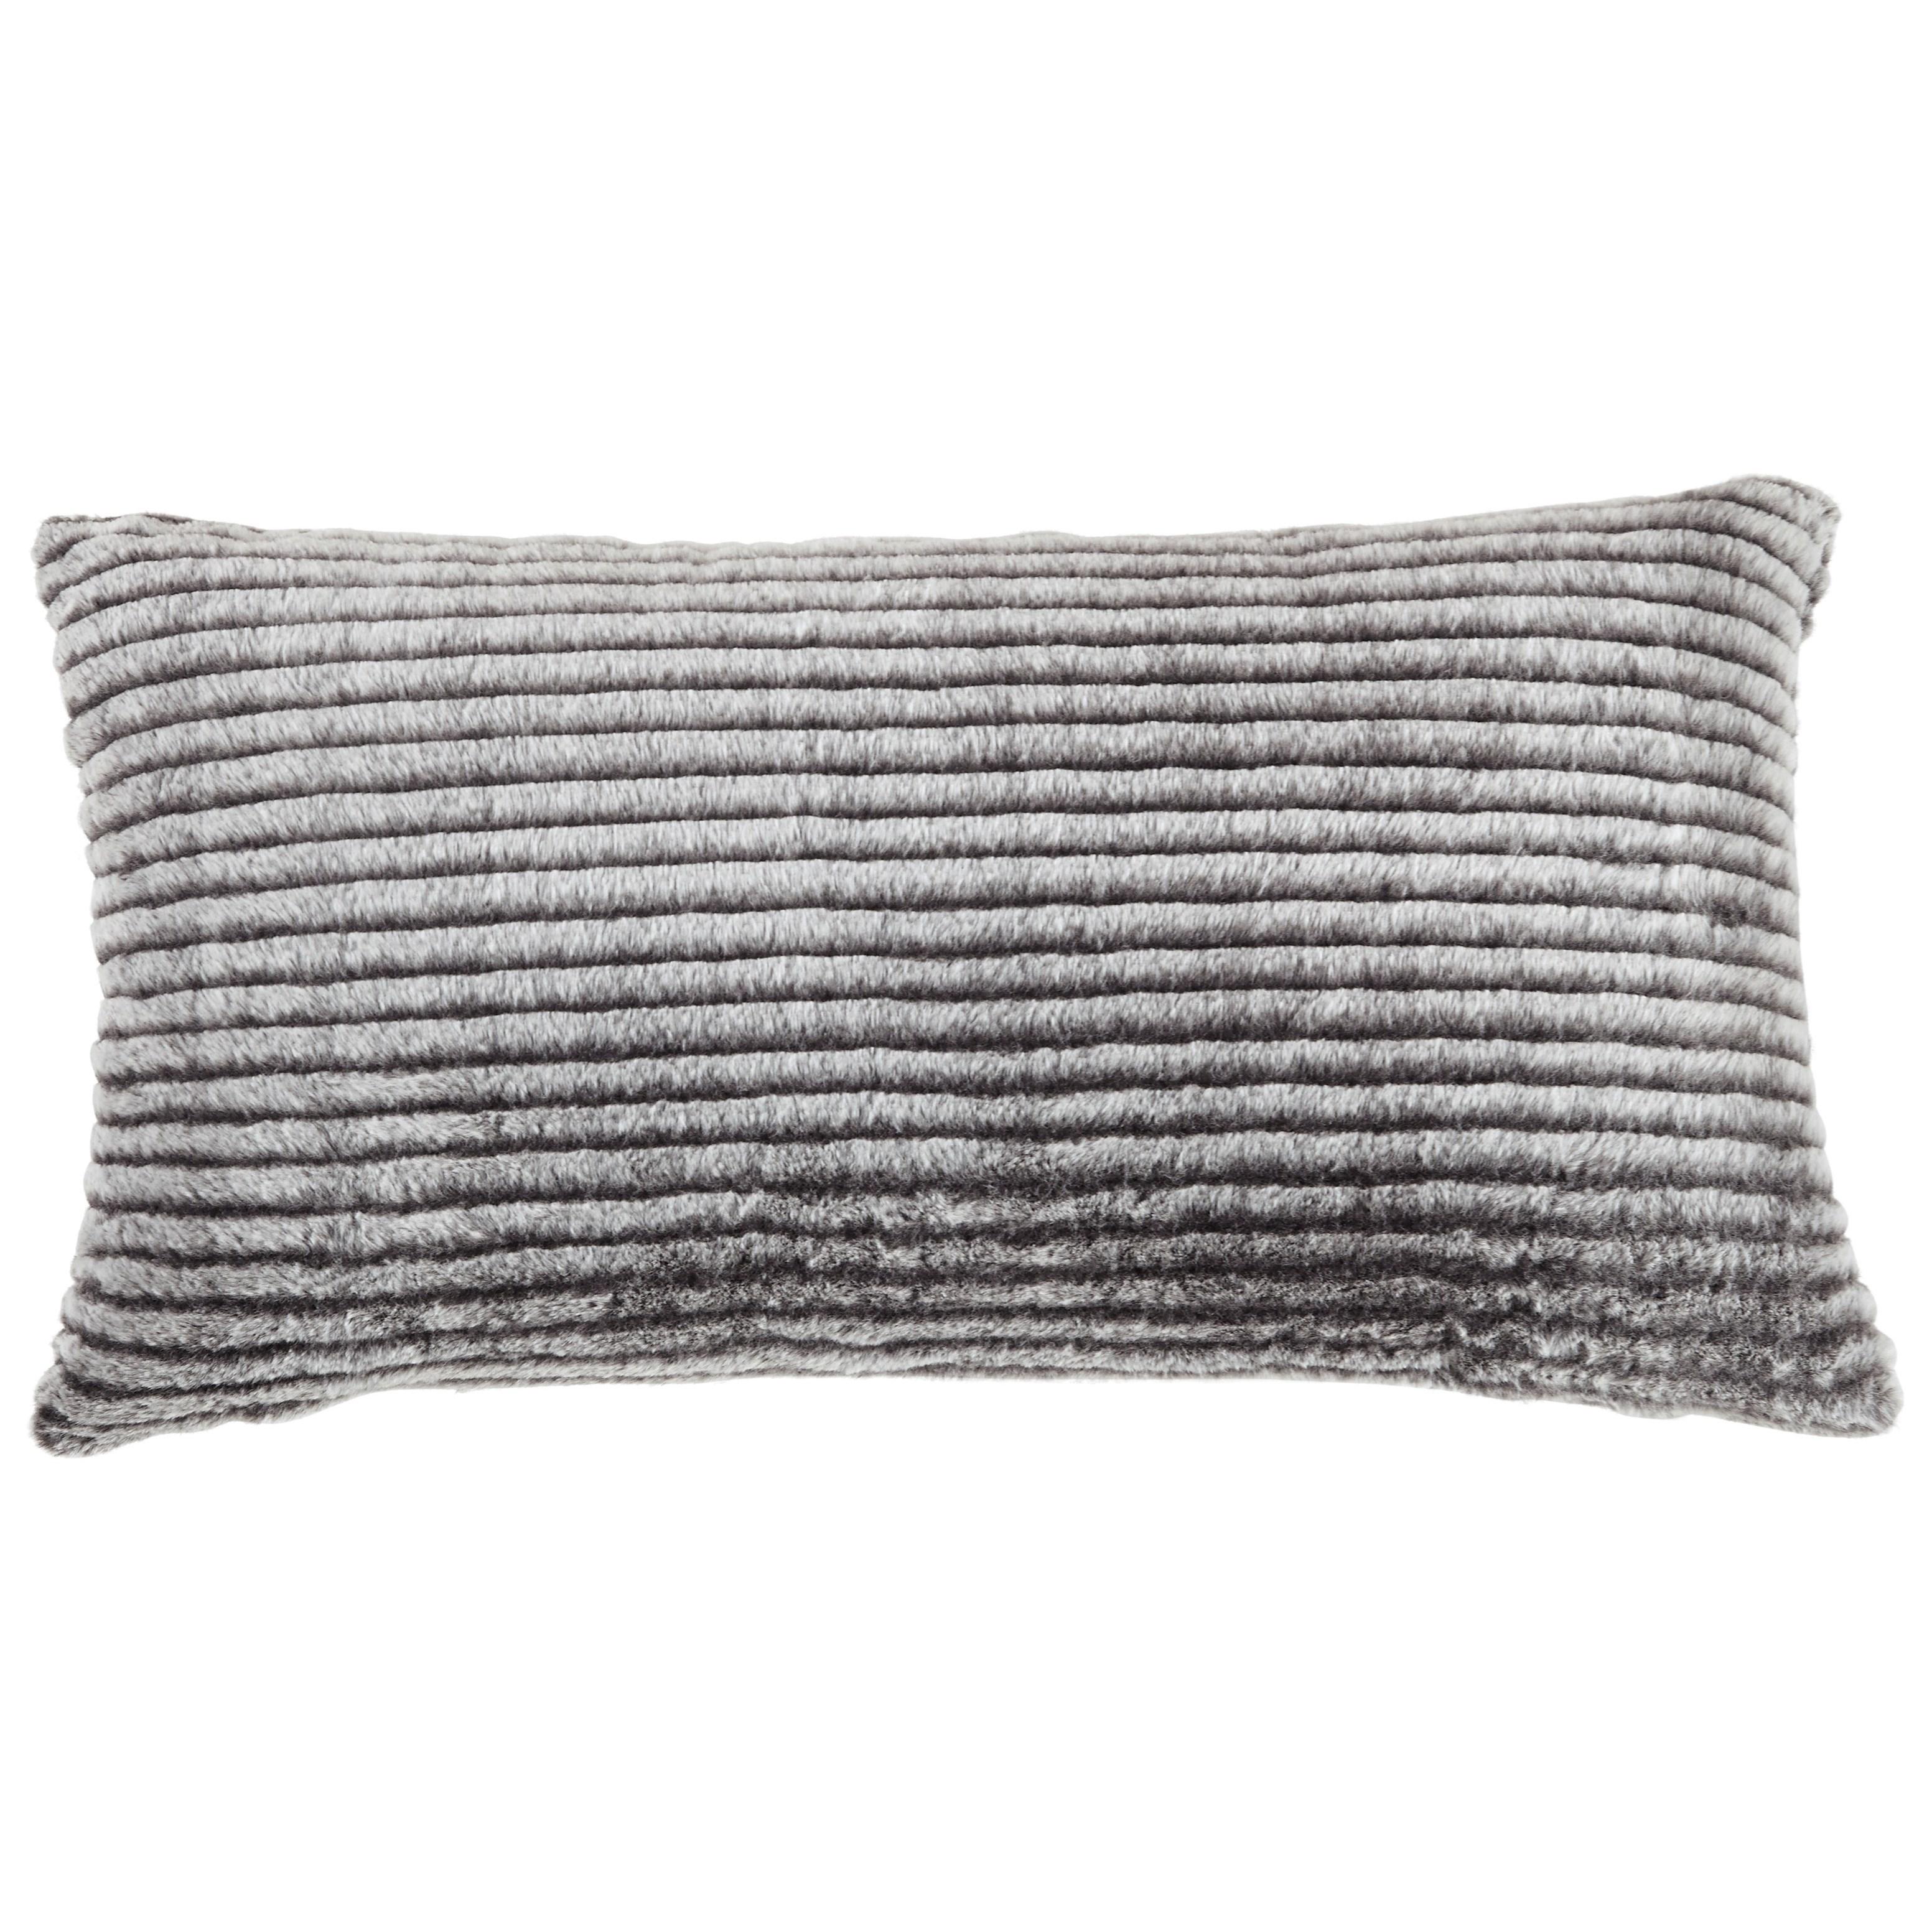 Metea Black/Gray Pillow